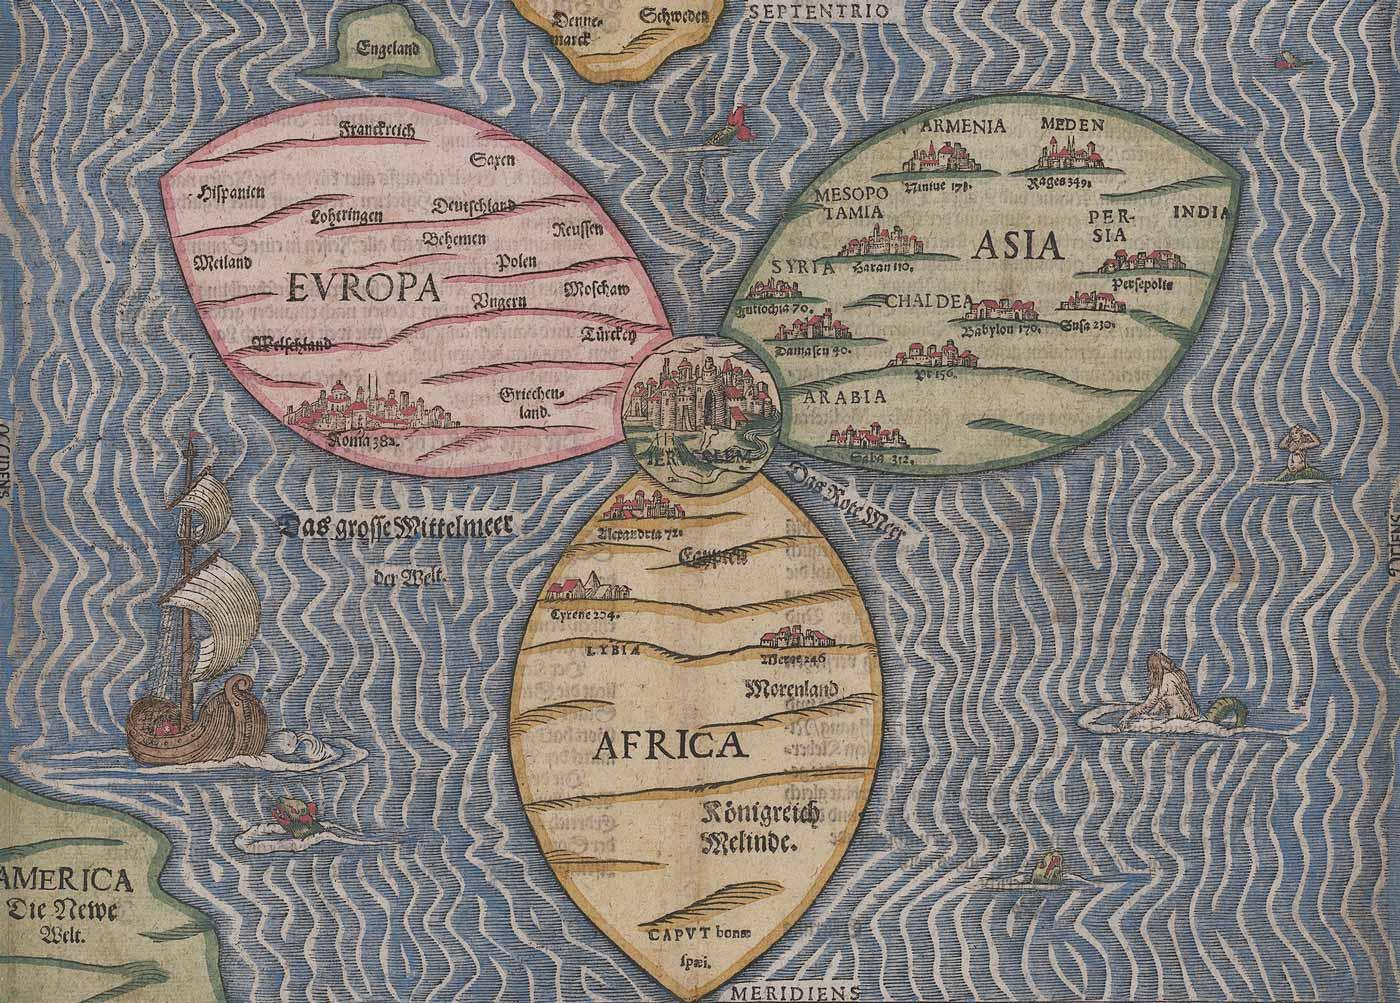 Historical clover leaf map with Jerusalem at the center.